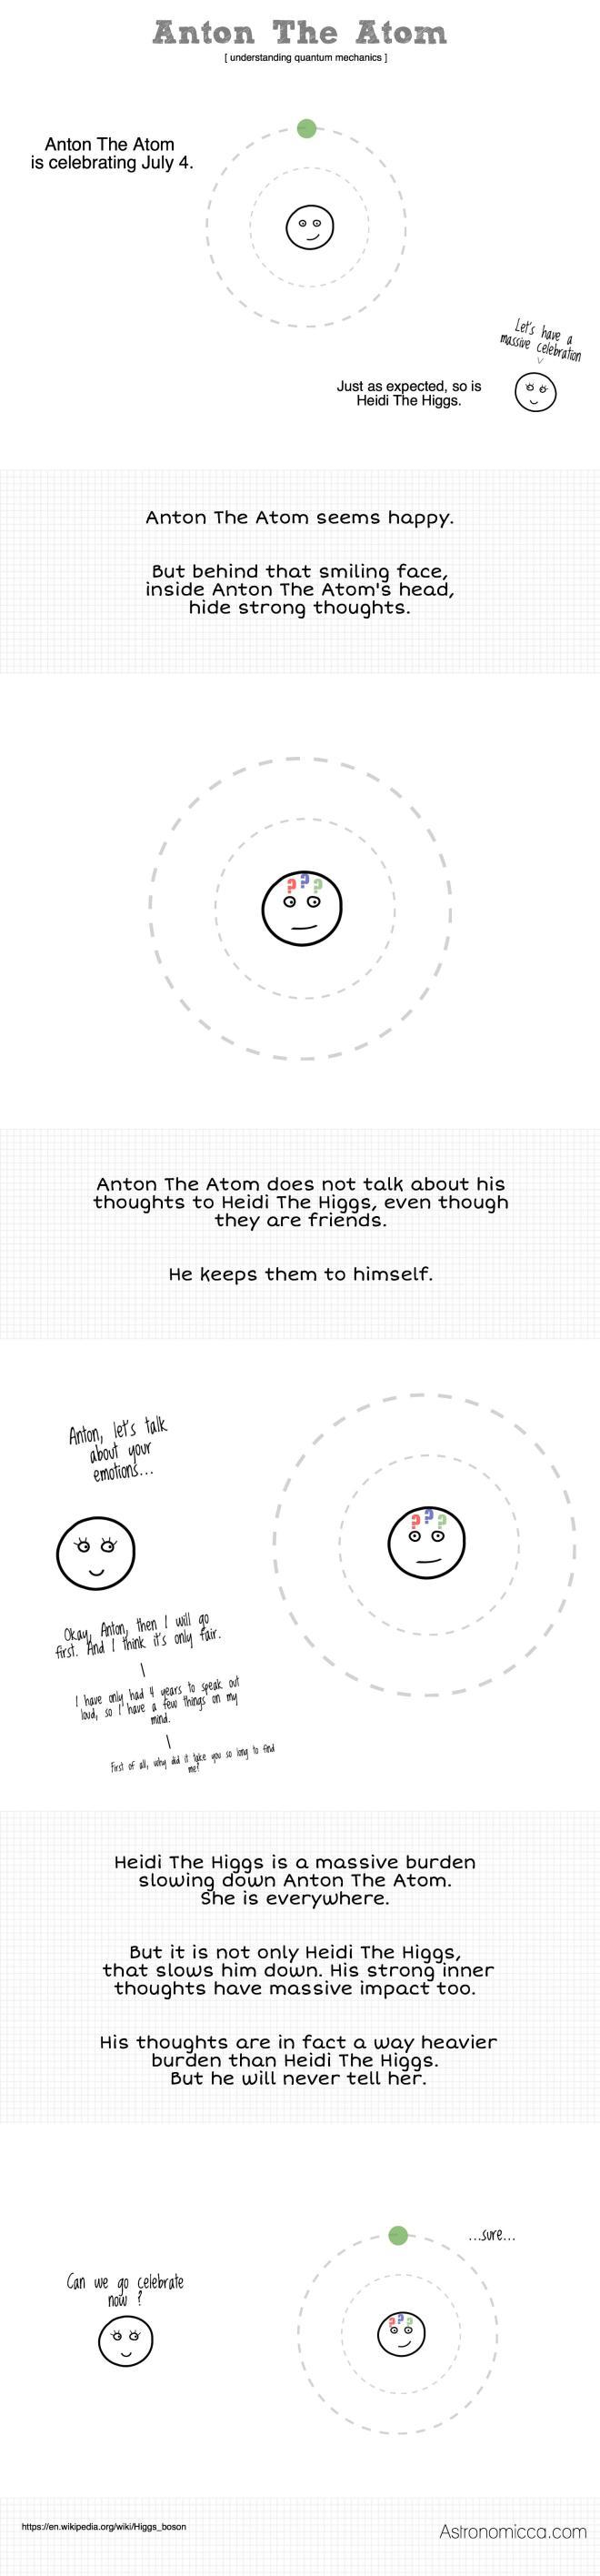 anton-the-atom-pt-2